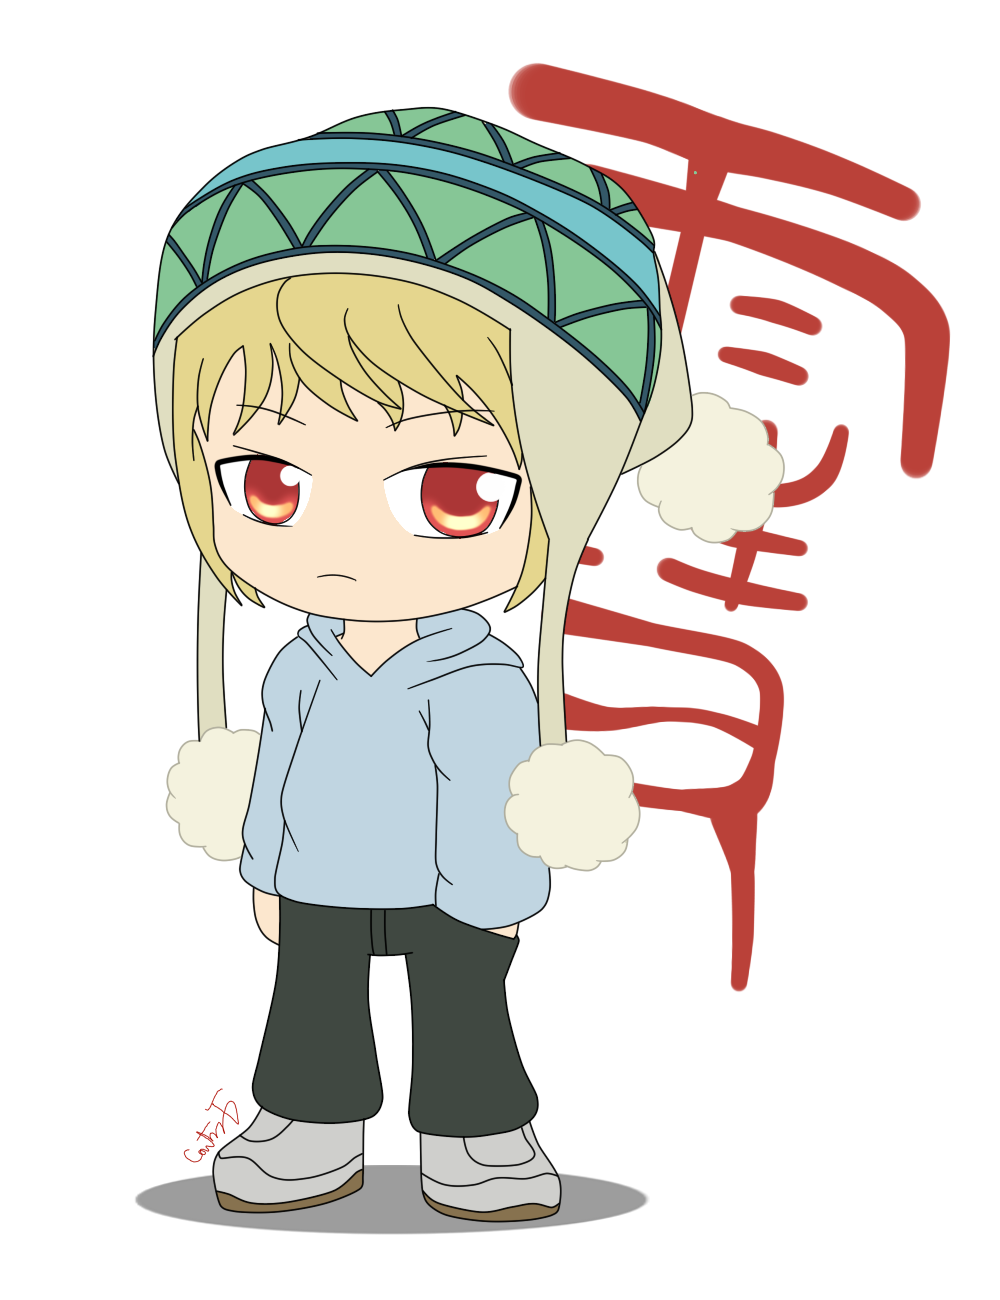 Yukine Noragami Chibi Yukine Chibi by Projec...